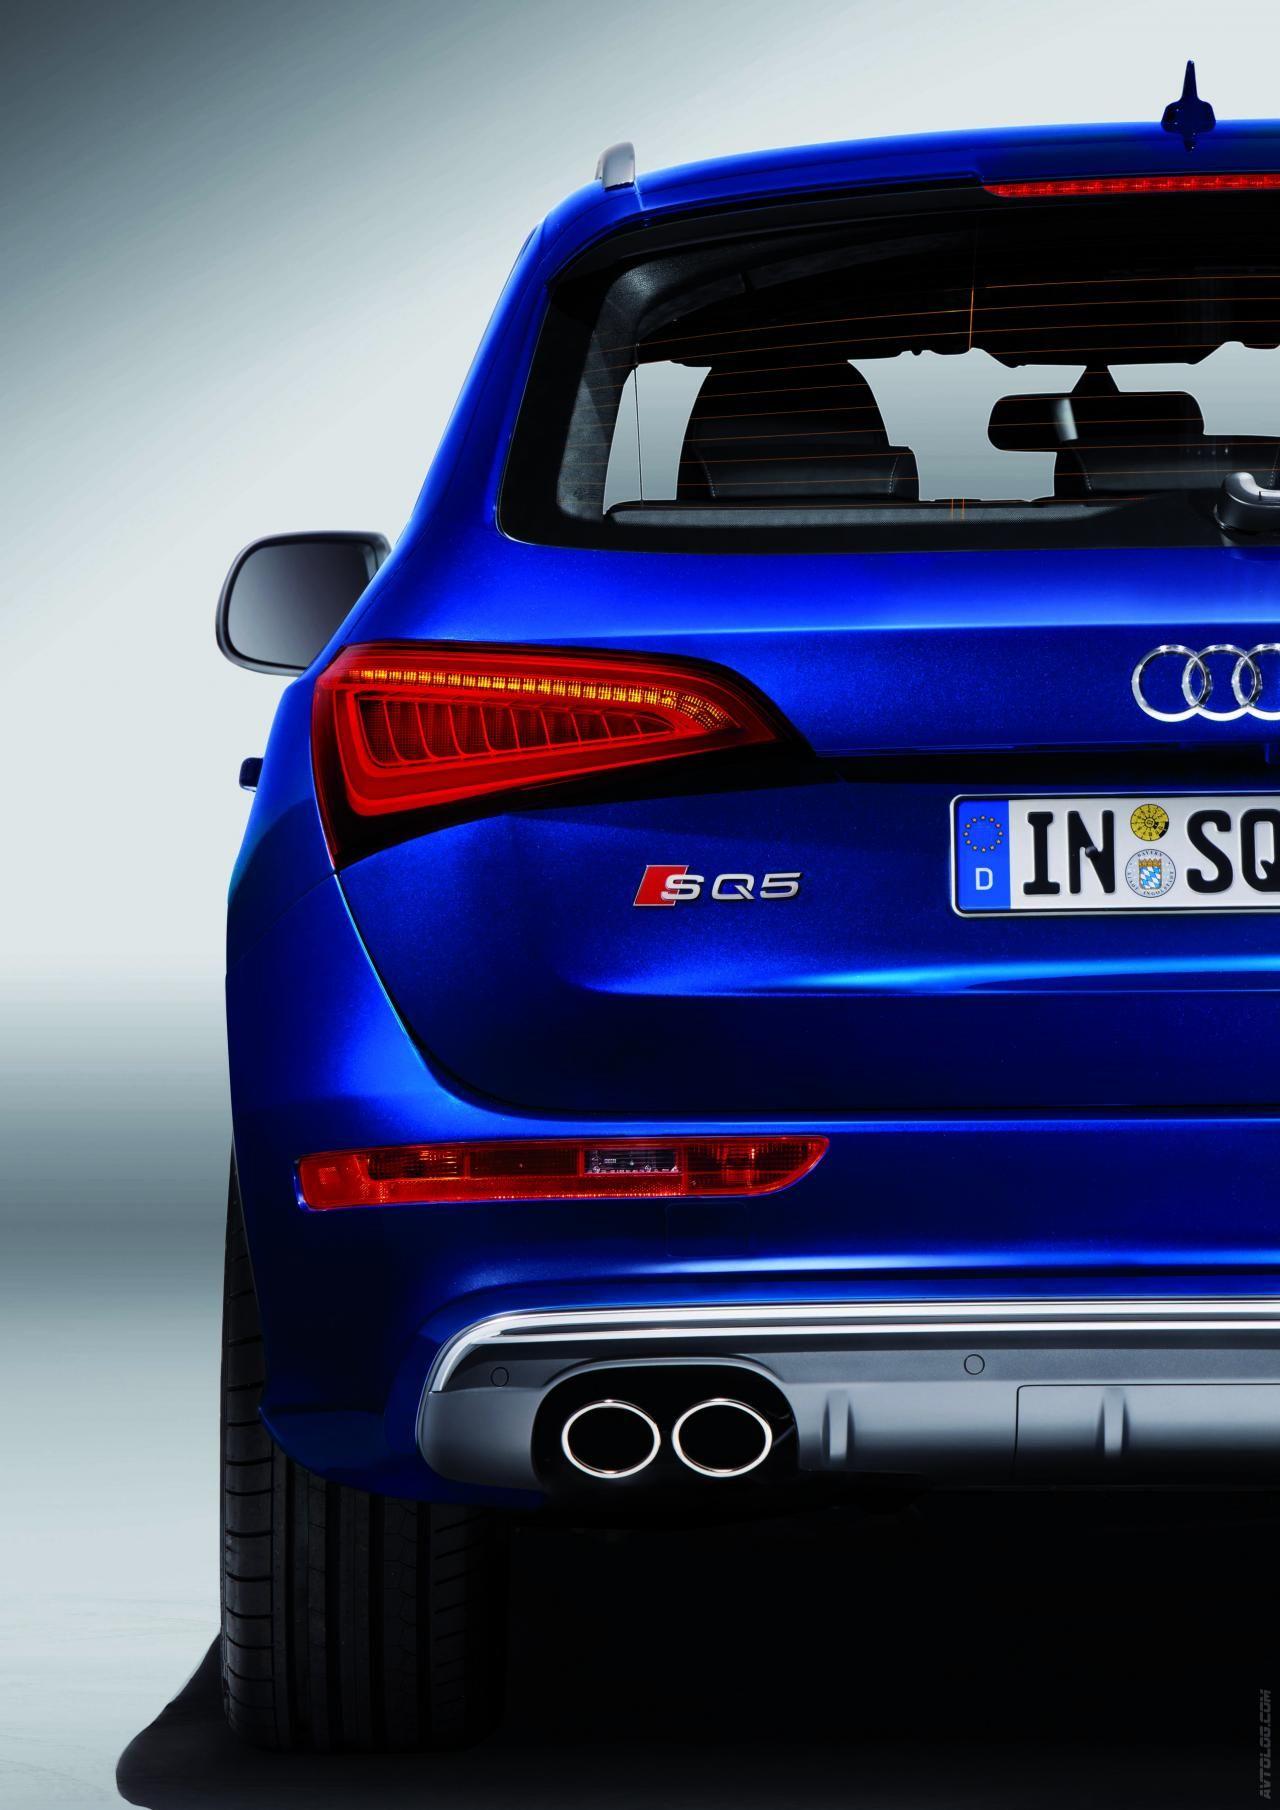 Katalog 2013 Audi Sq5 Tdi Audi Sq5 Audi Cars